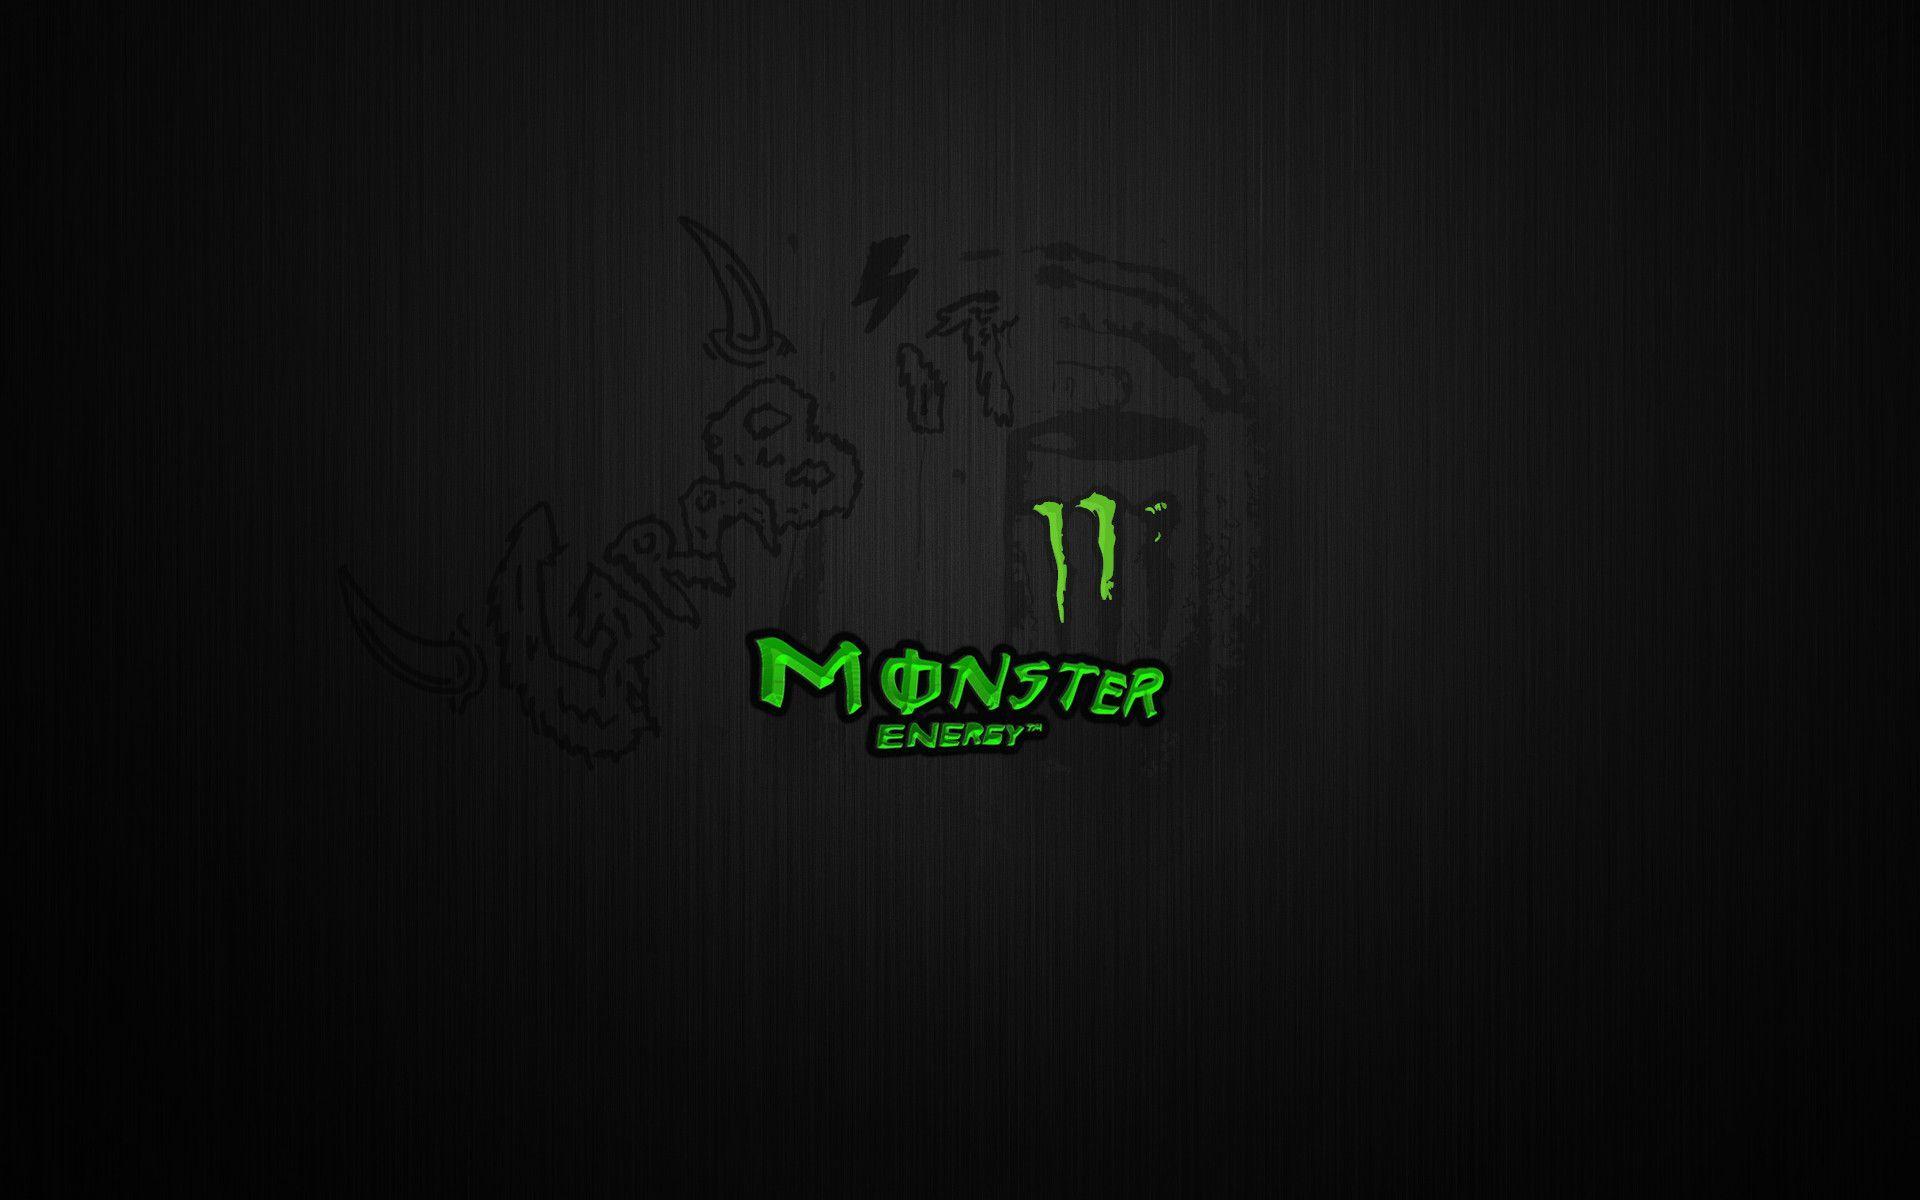 monstar games wiki